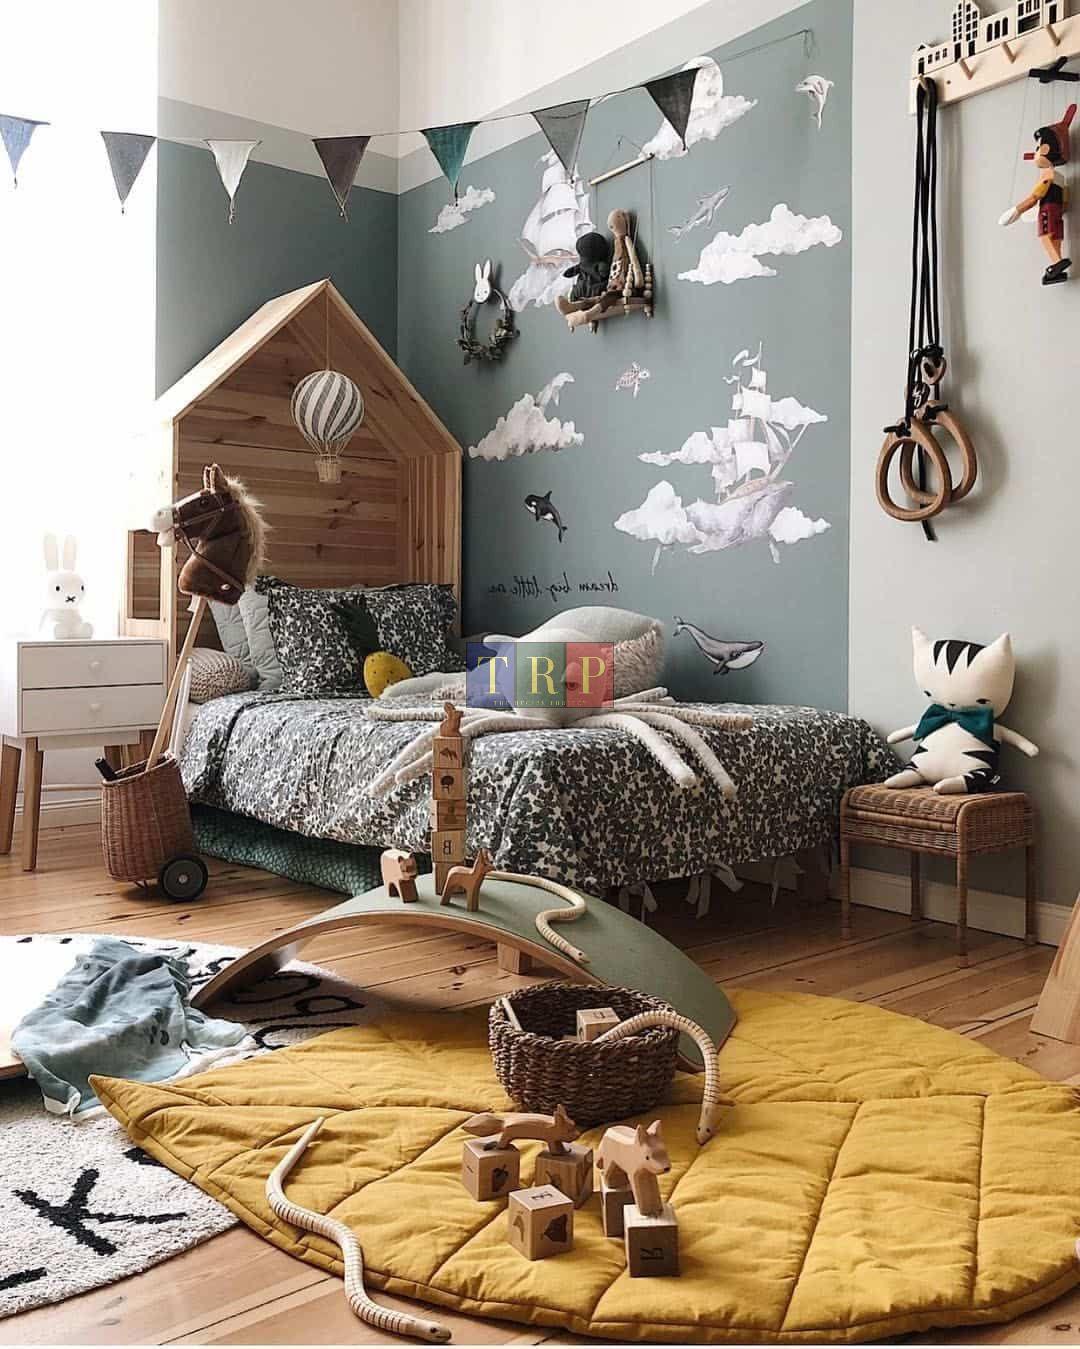 Kids Room Interior 2021 Pastel Colors In 2021 Baby Room Colors Bedroom Trends Kid Room Decor